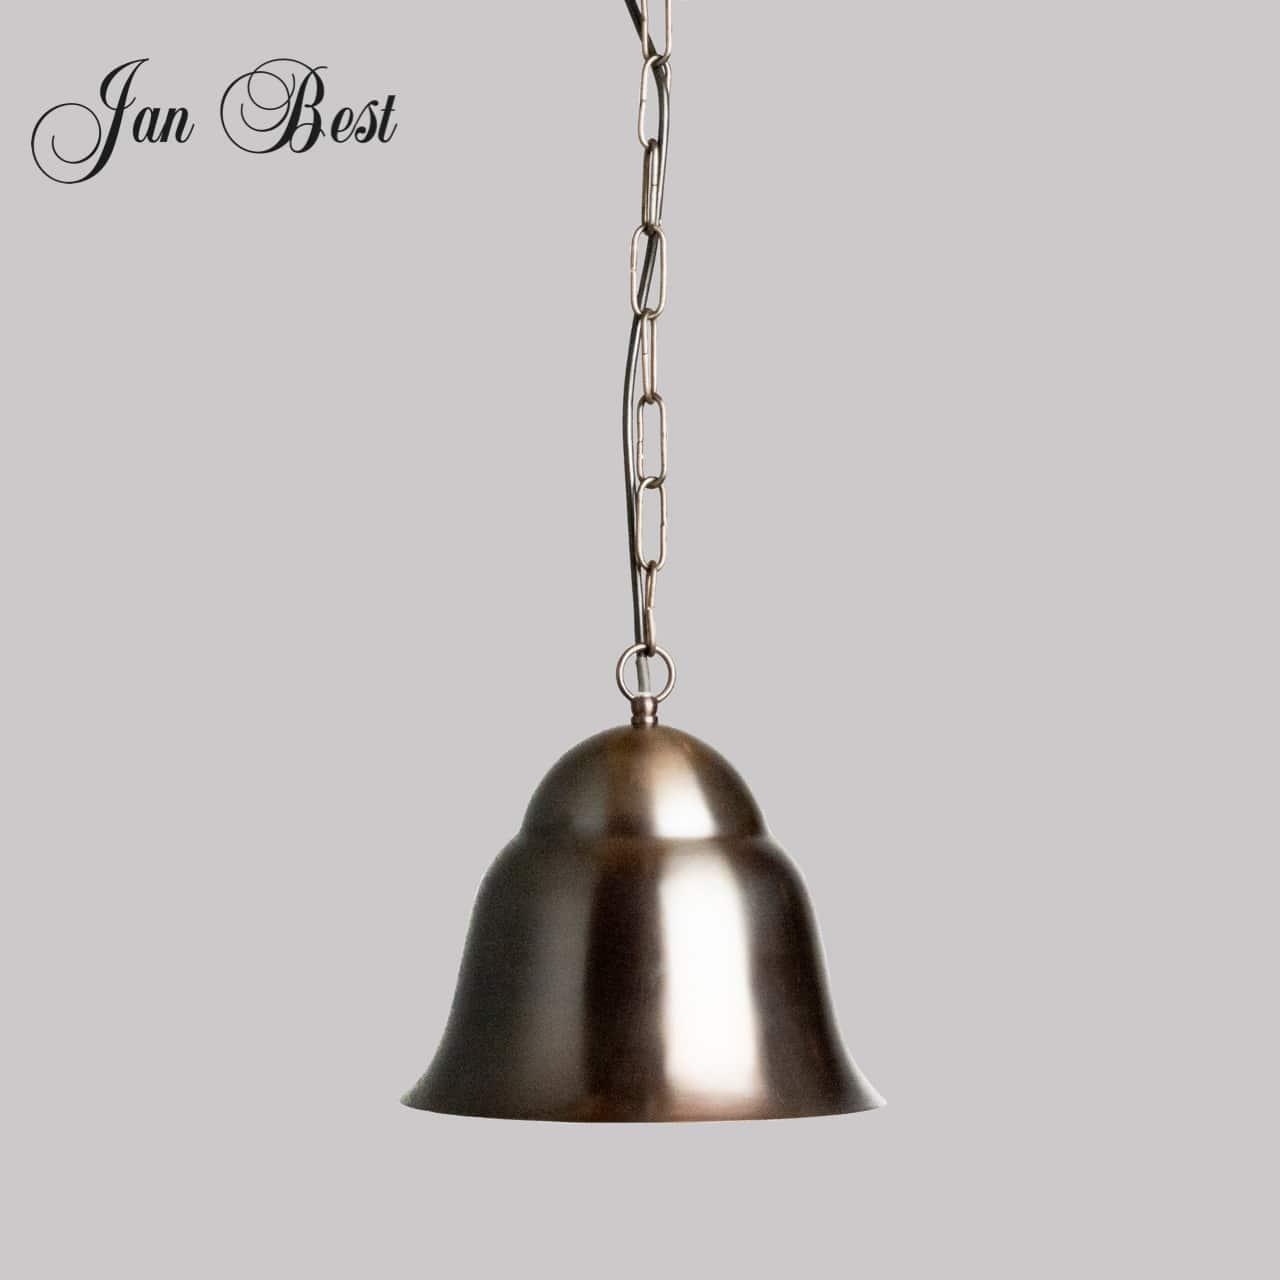 jan-best-hanglamp-brons-messing-horeca-verlichting-nostalgische-verlichting-klassieke-verlichting-aalsmeer